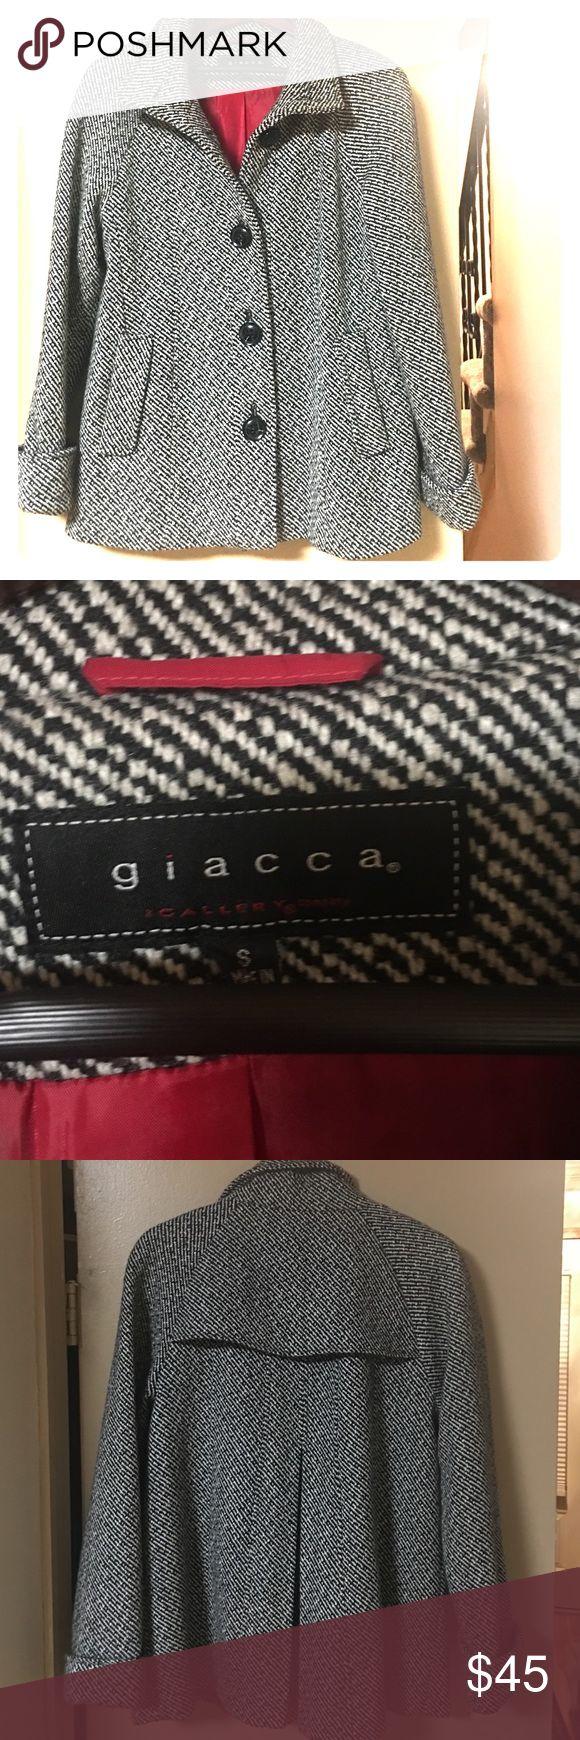 Giacca swing coat Black and white tweed Giacca Jackets & Coats